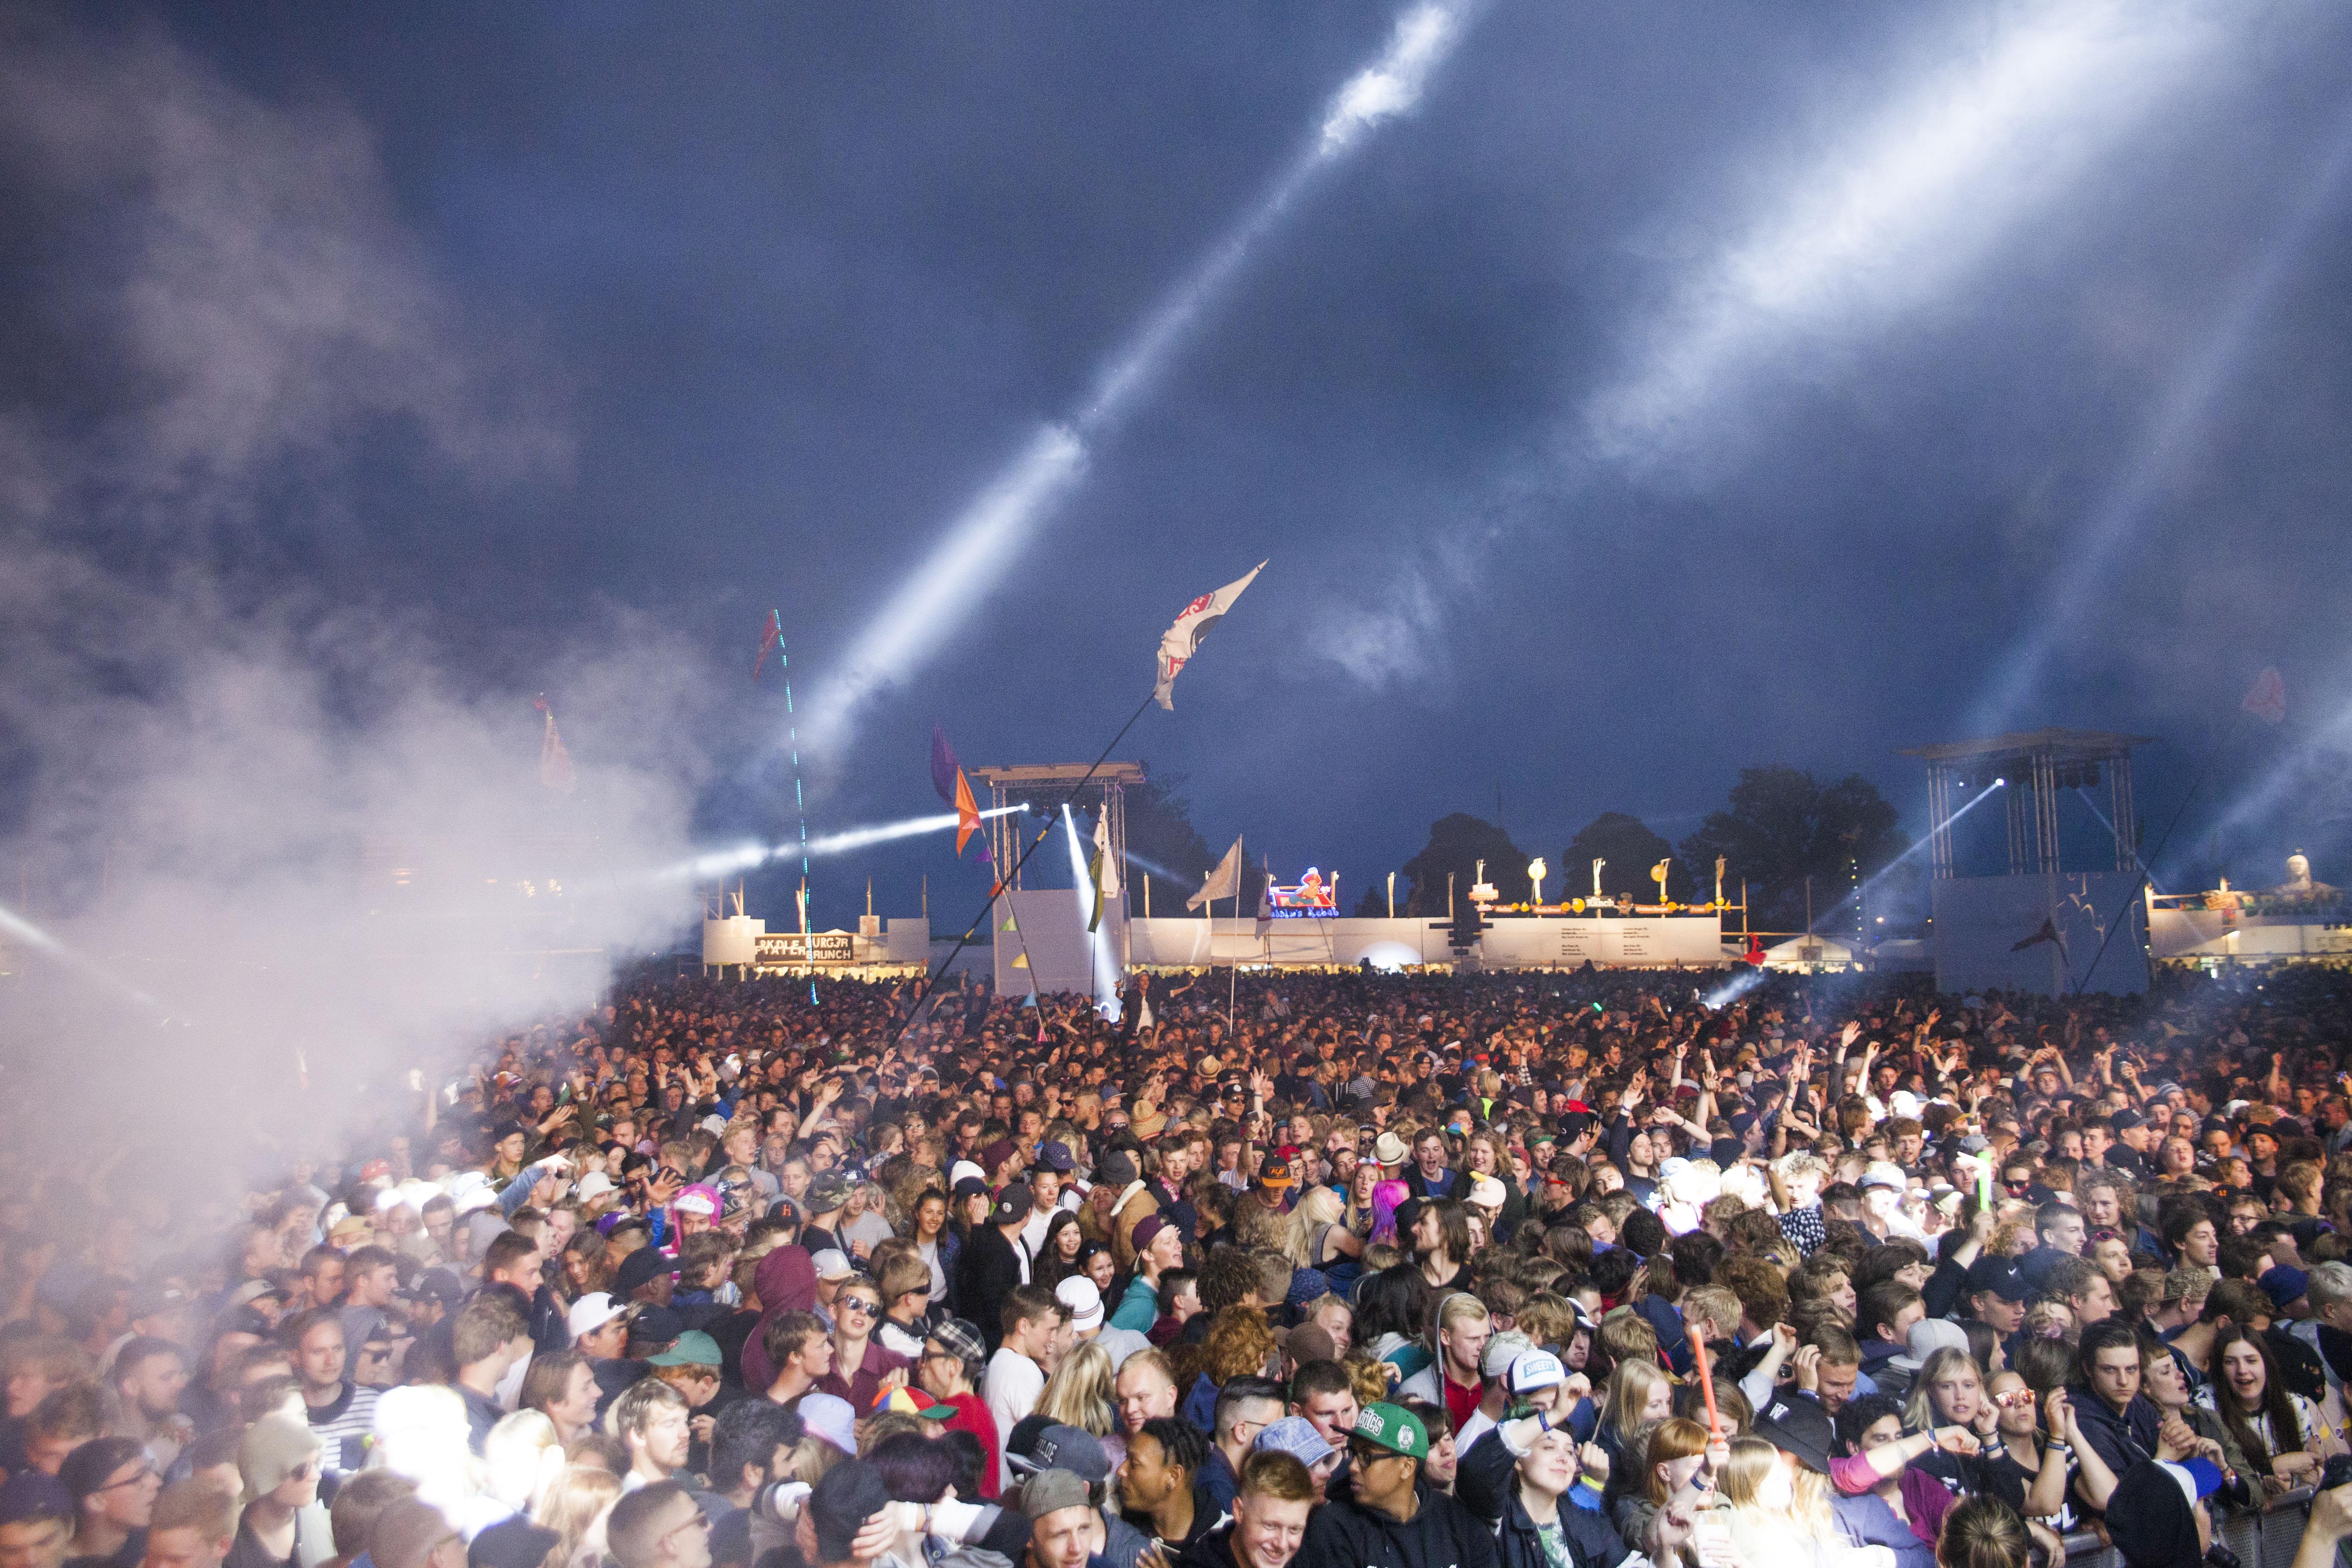 AVAVAV_GAFFADK_RoskildeFestival15_HelenaLundquist_14